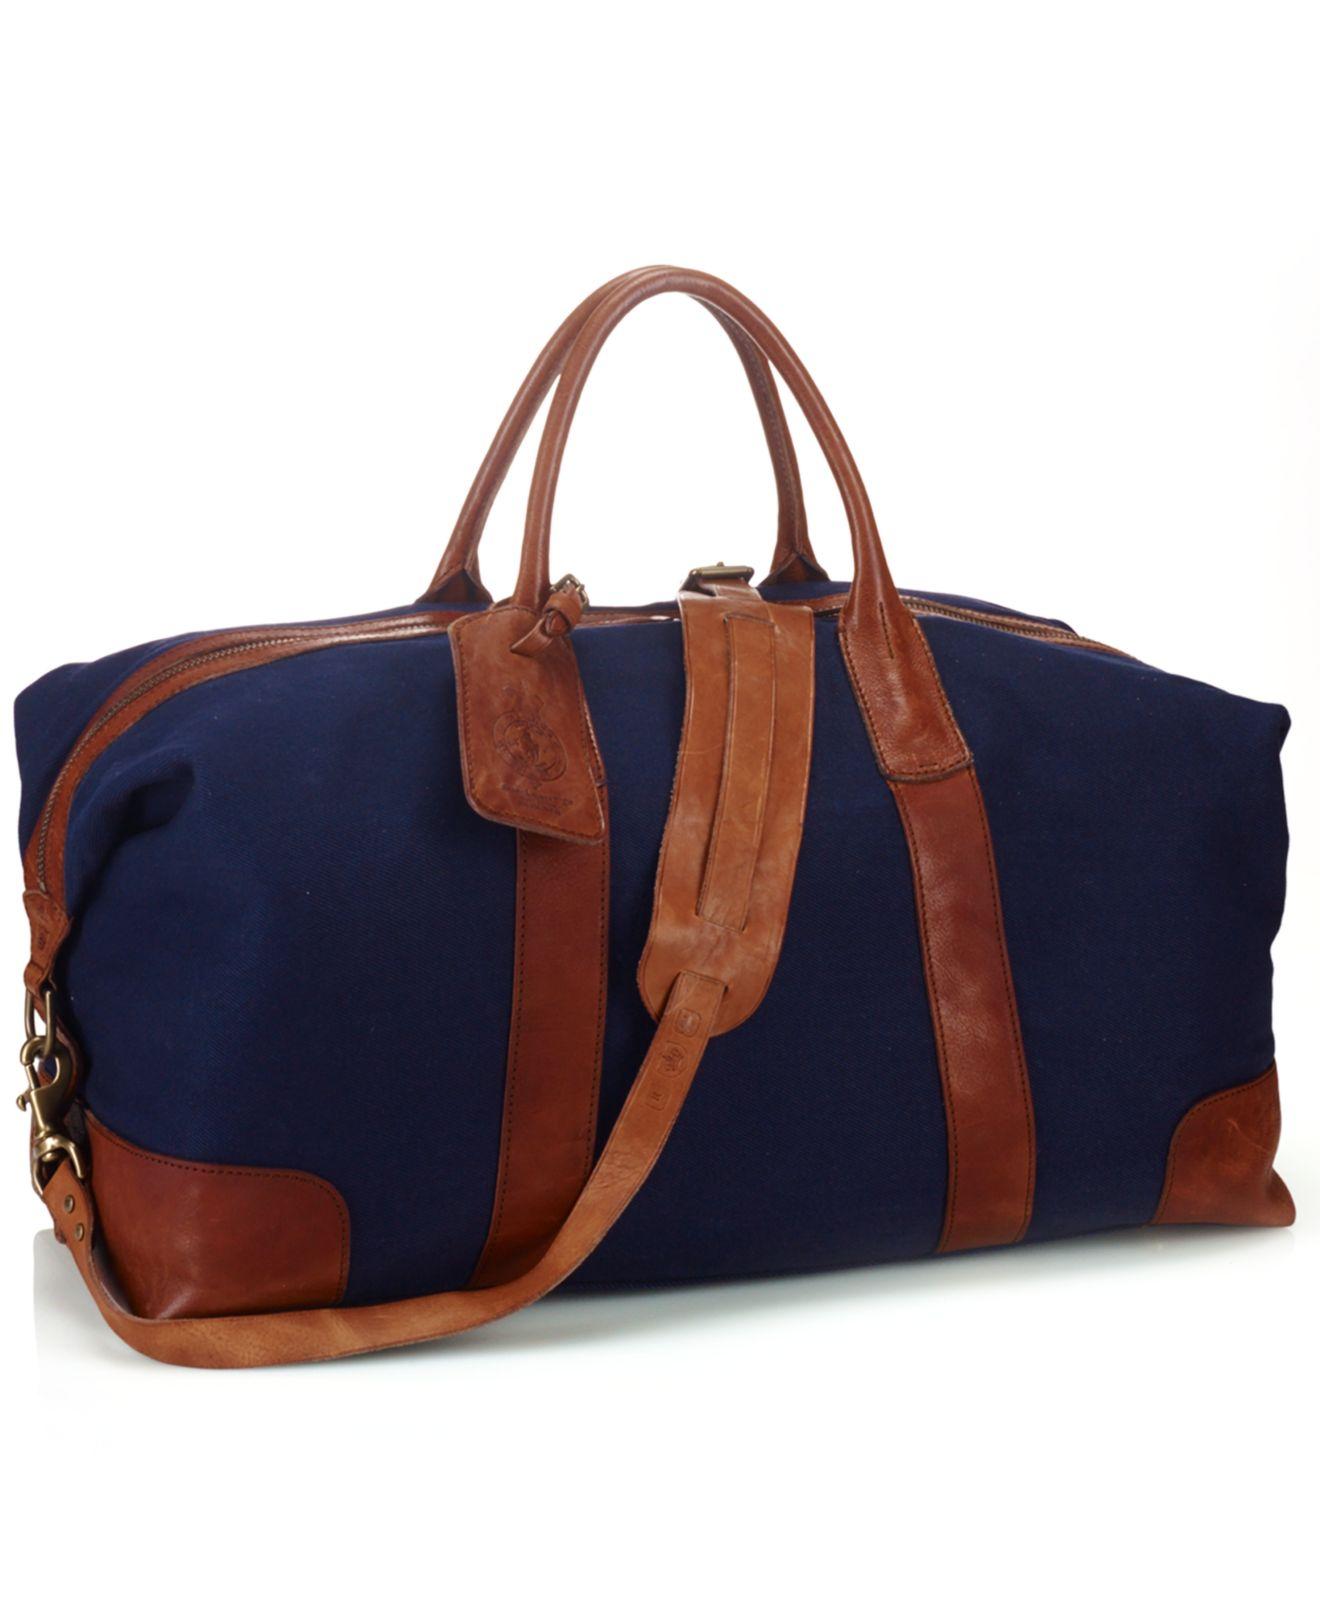 db93590db935 Lyst - Polo Ralph Lauren Canvas Duffel Bag in Blue for Men